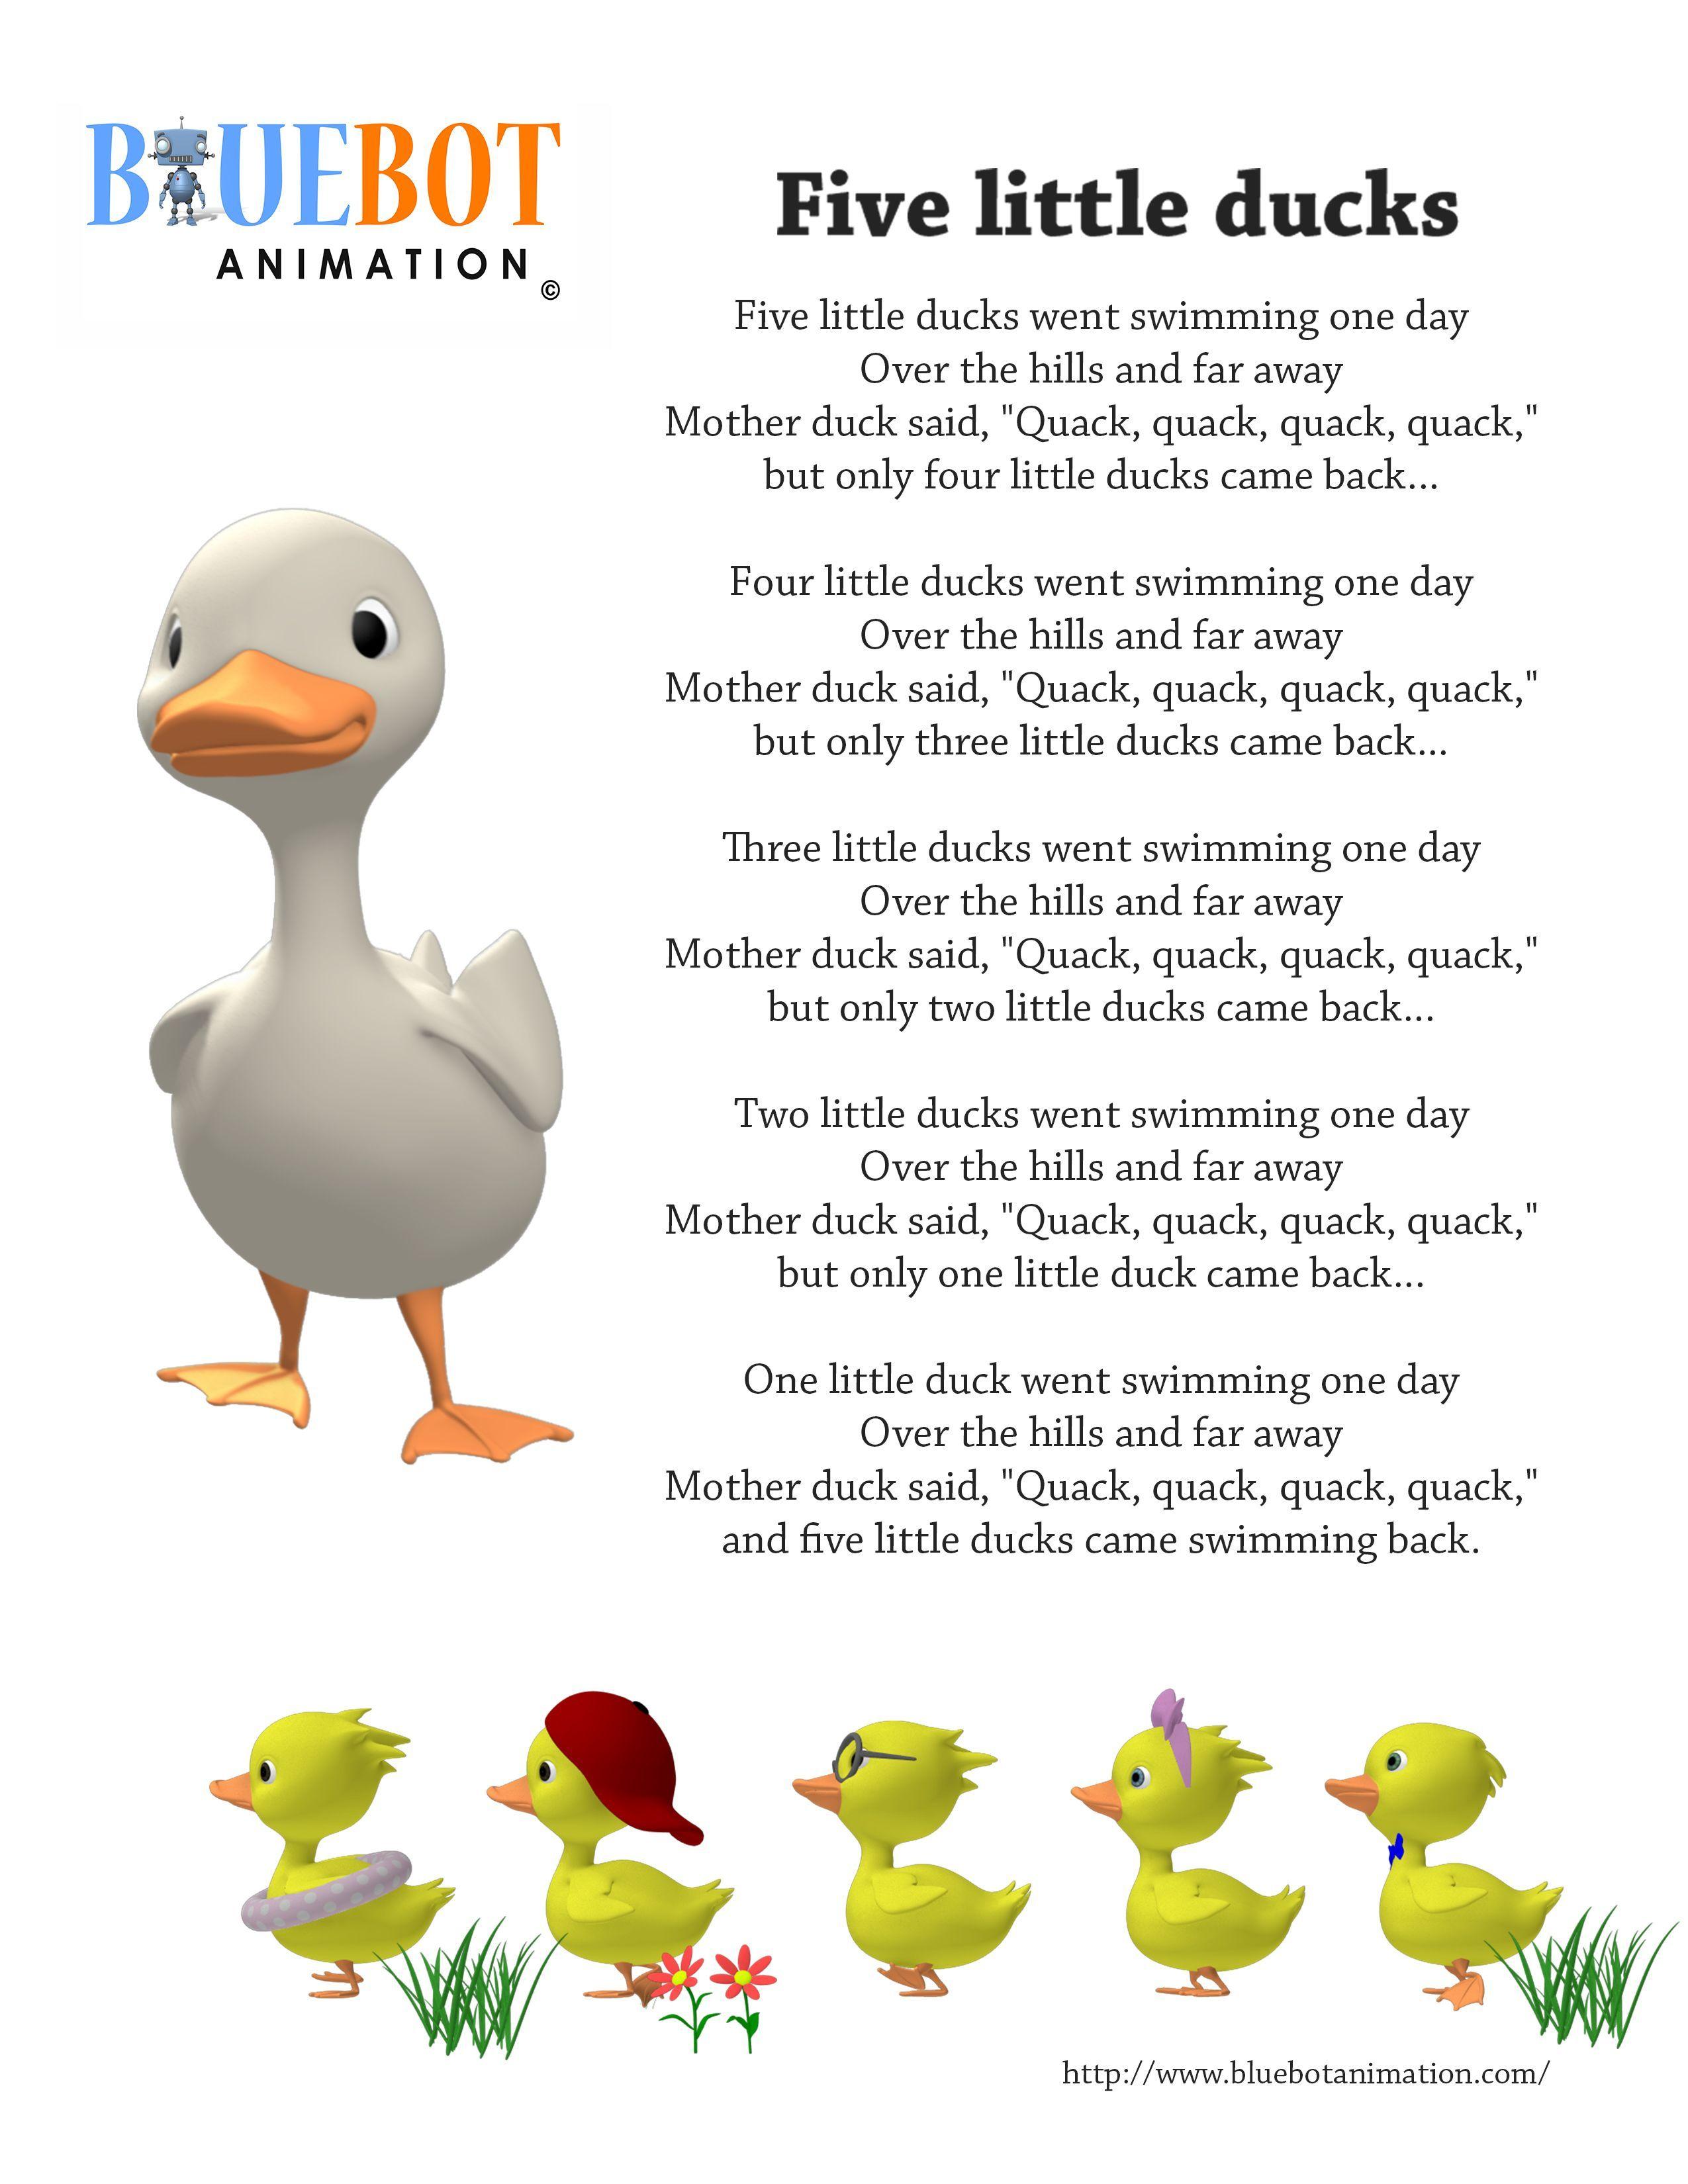 Five Little Ducks 5 Little Ducks Nursery Rhyme Lyrics